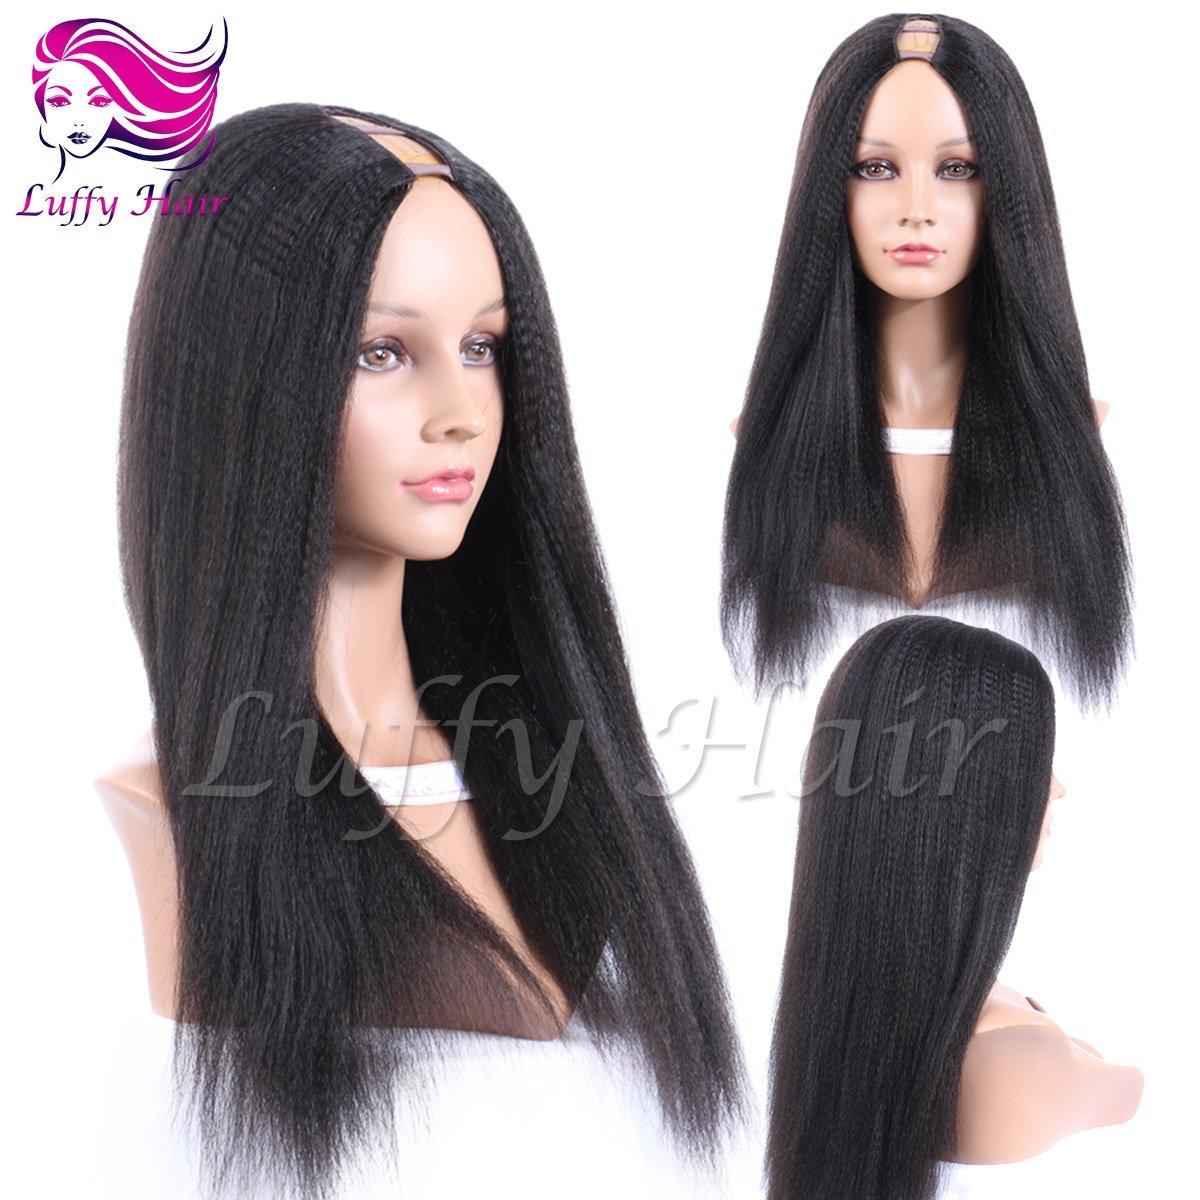 8A Virgin Human Hair Italian Yaki Straight U Part Wig - KWU004